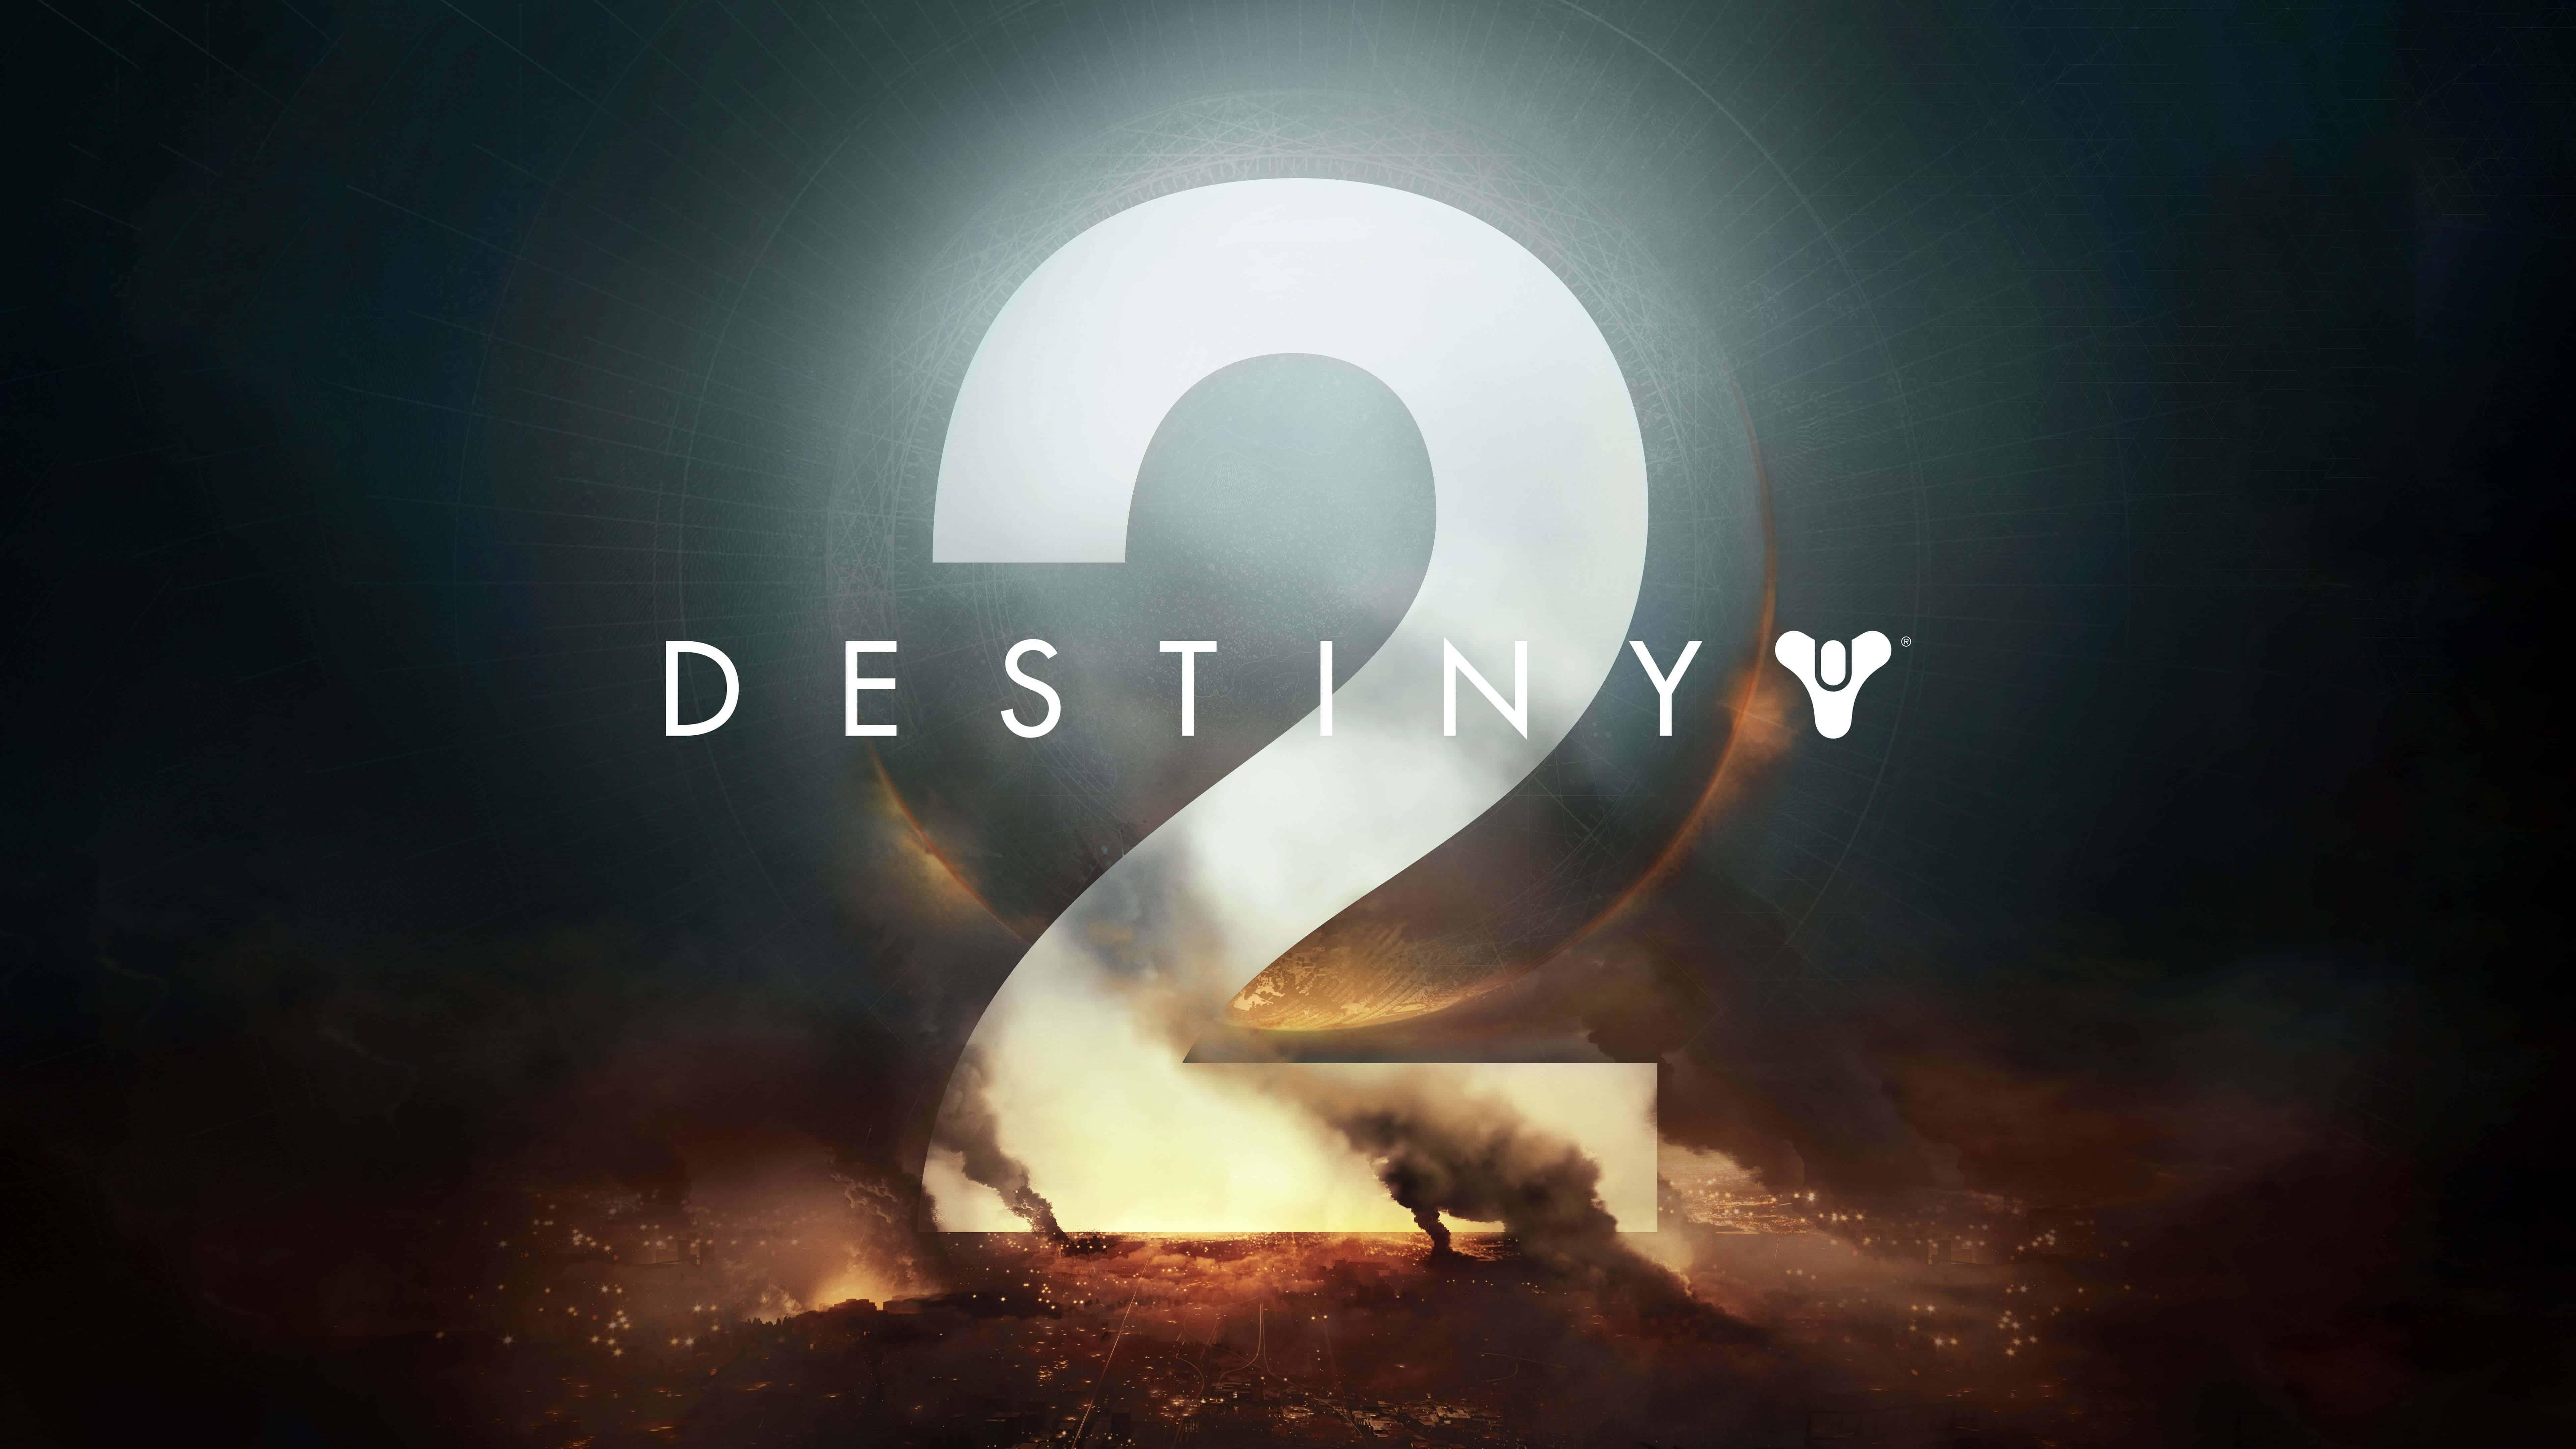 destiny 2 logo uhd 8k wallpaper